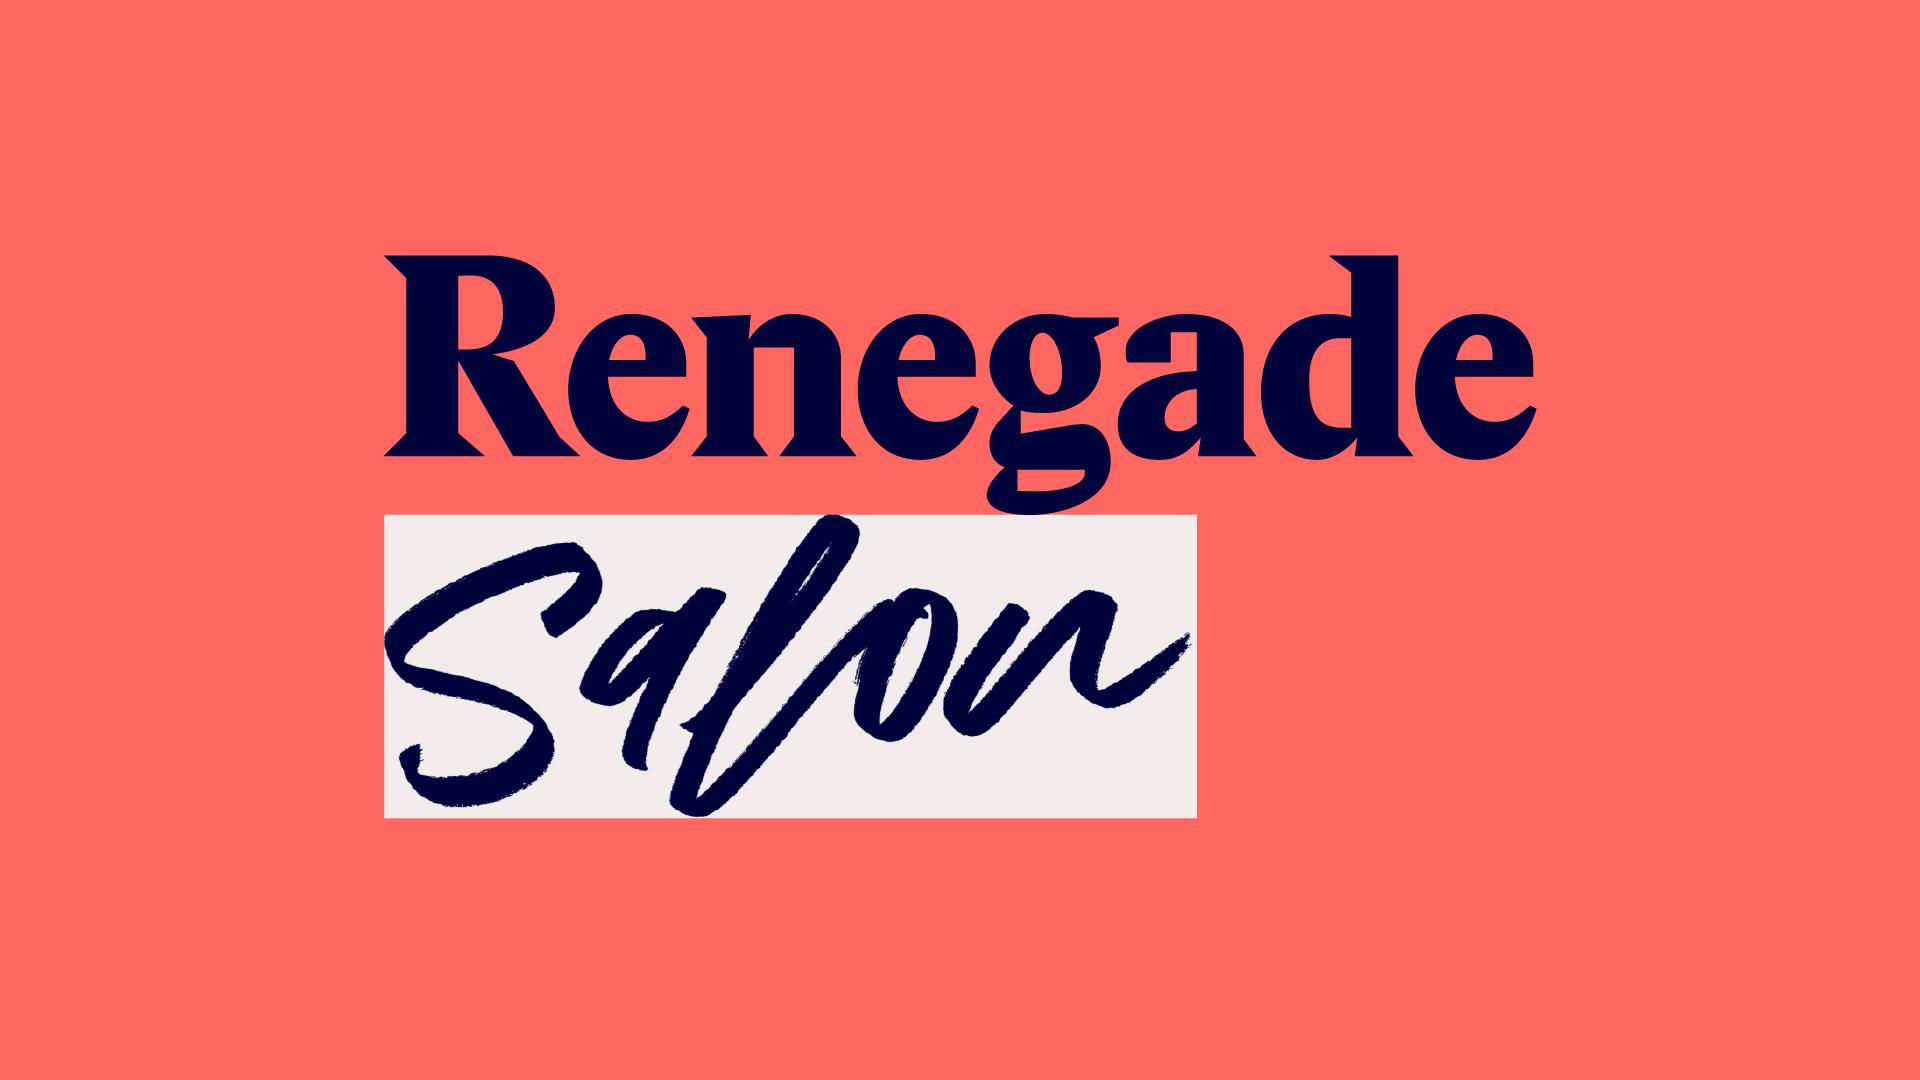 Renegade Salon